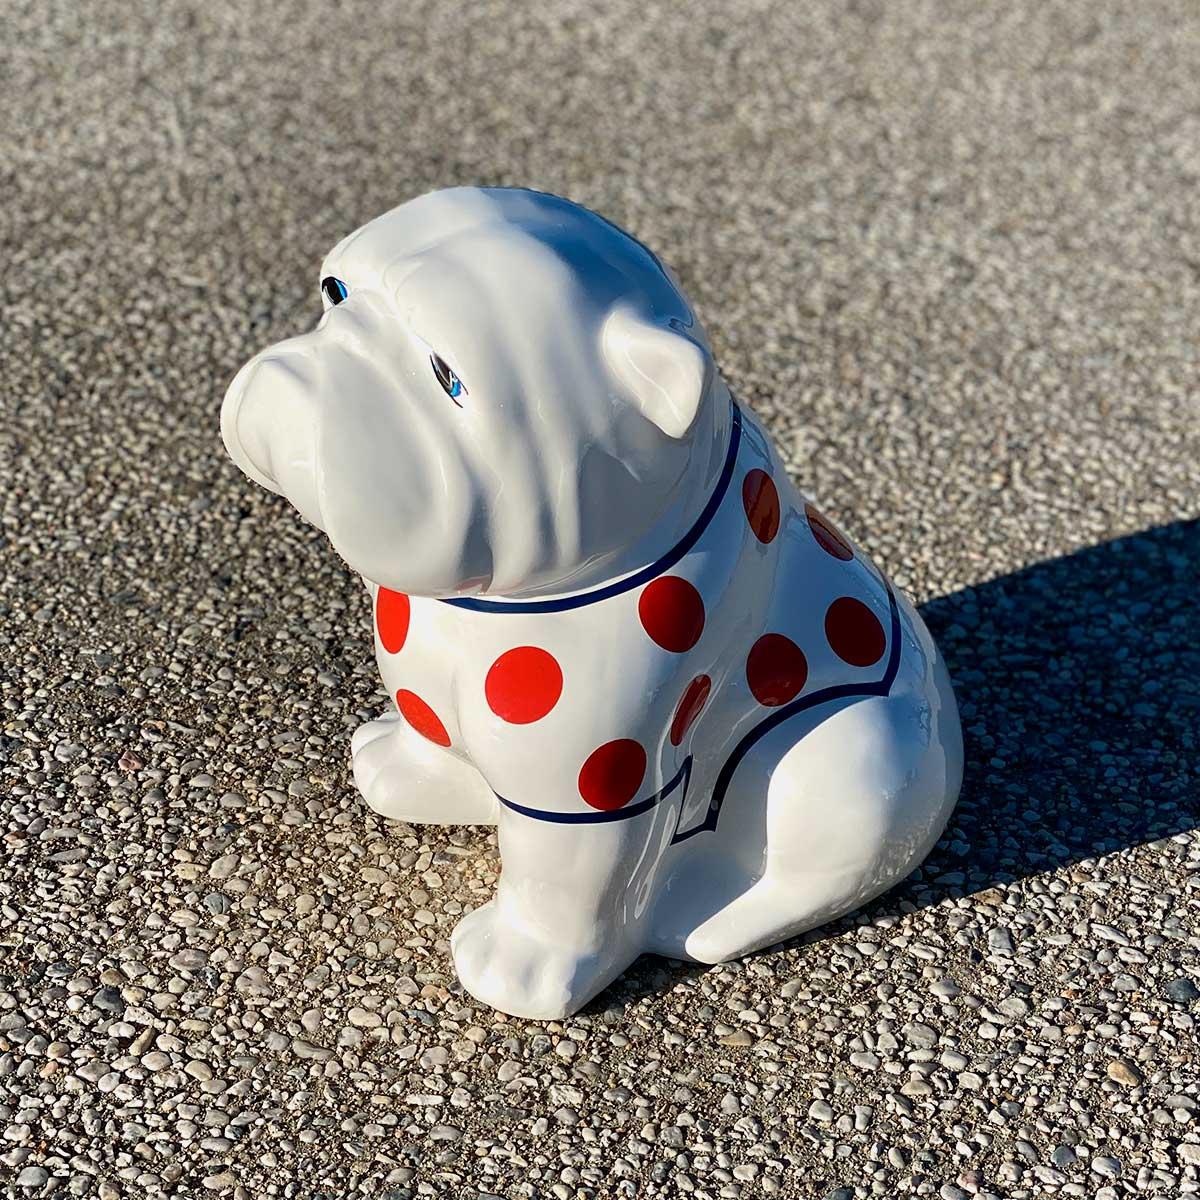 bulldog mailot petits pois résine